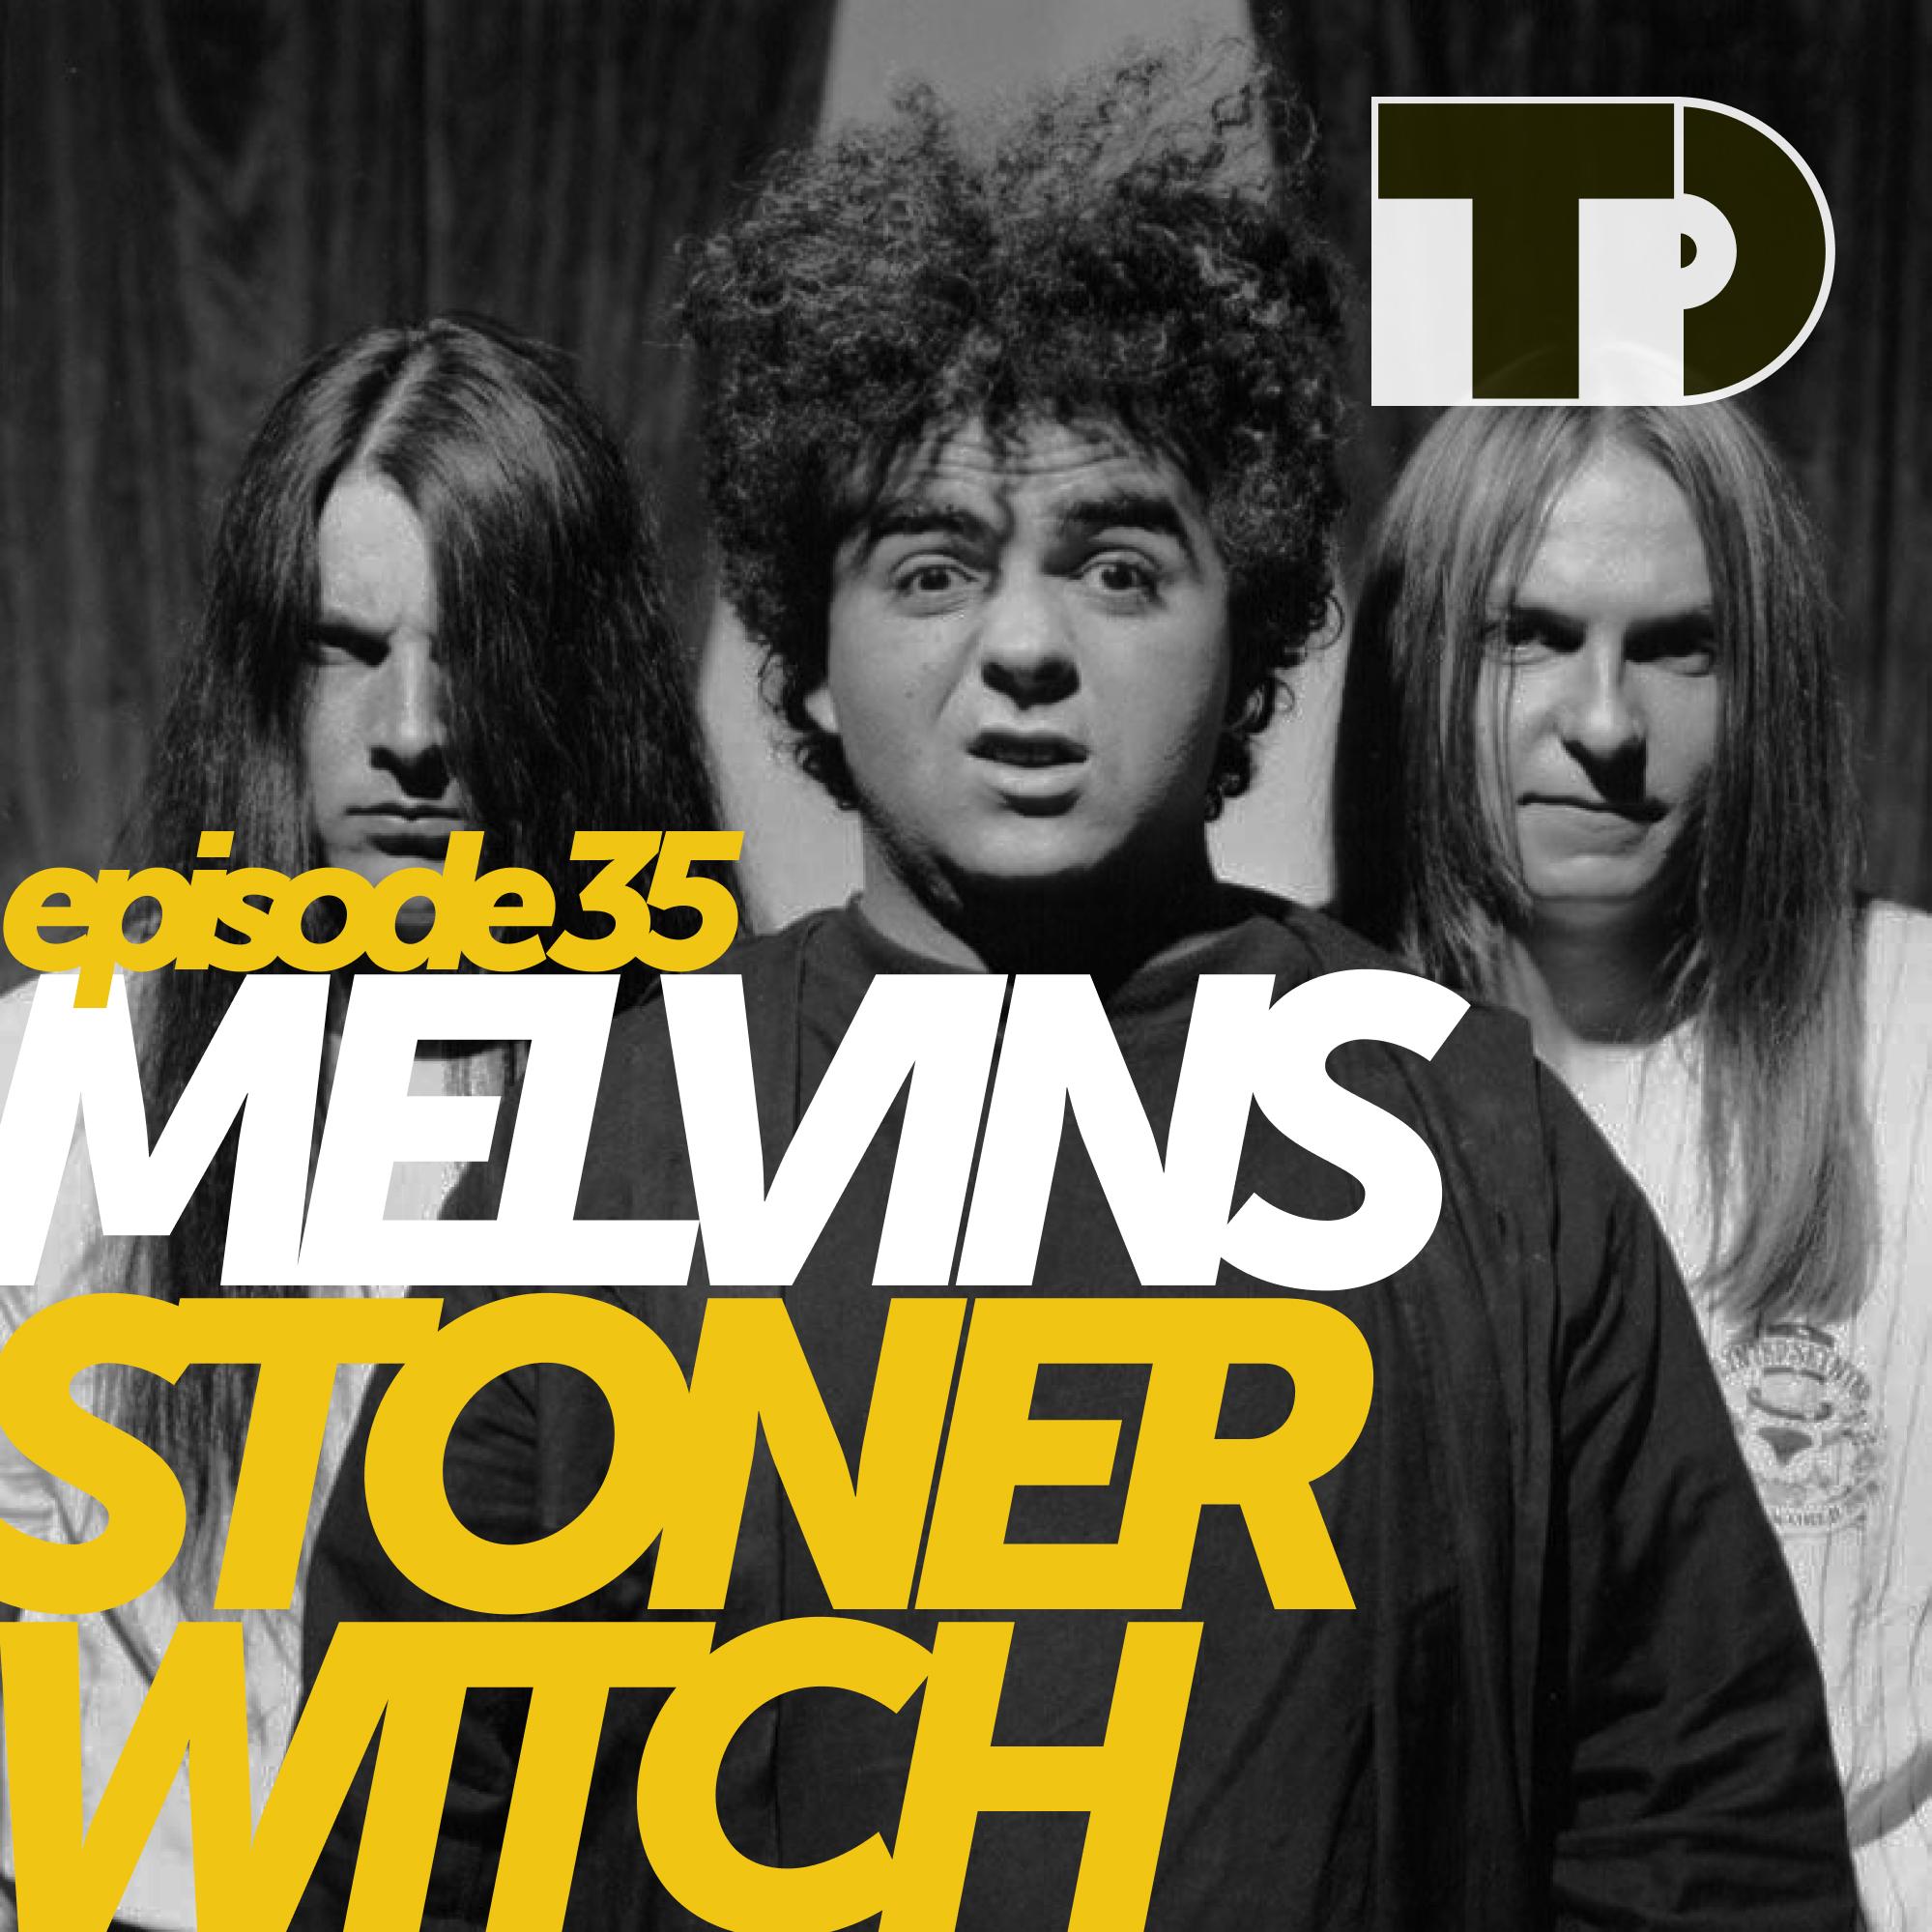 Melvins the making love demo Tunedig Episode 35 Melvins S Stoner Witch Tunedig